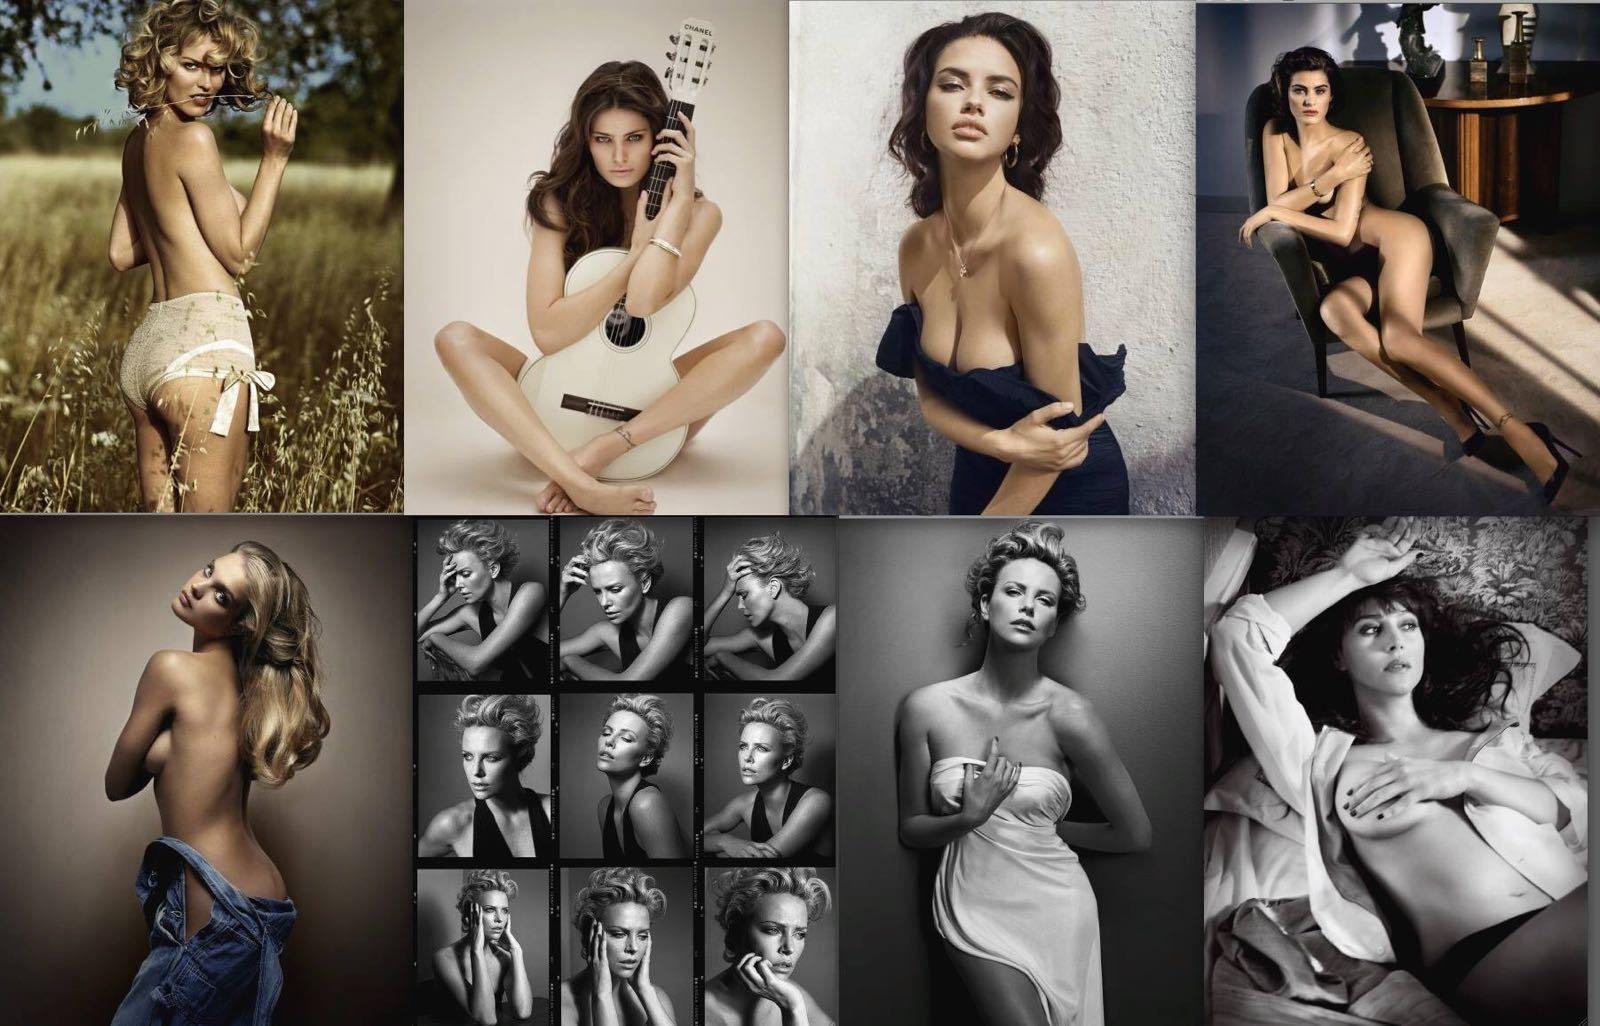 IMMAGIS FINE ART PHOTOGRAPHY